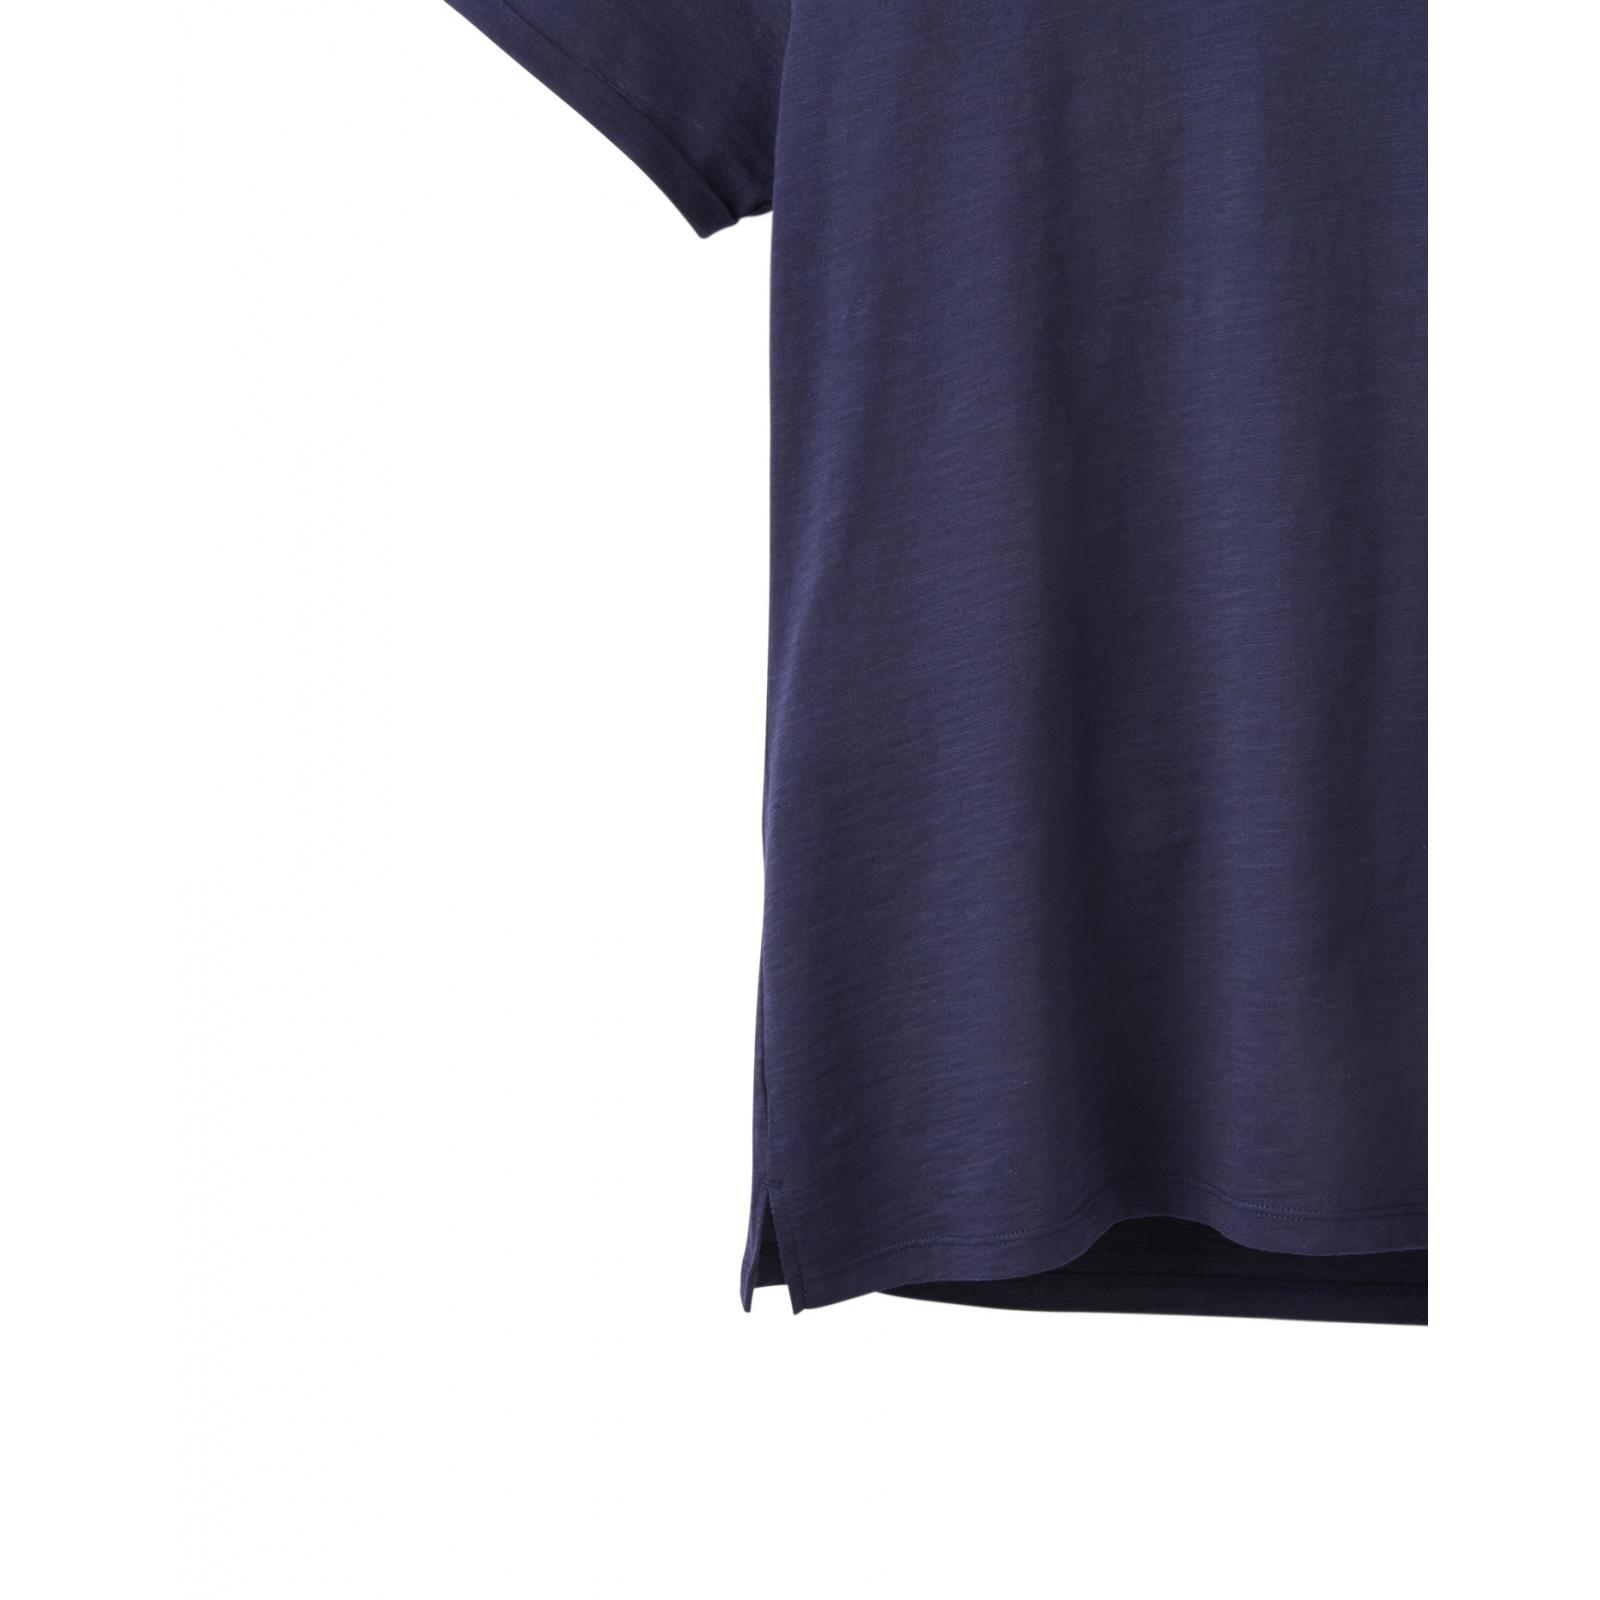 Joules-Nessa-ligero-Jersey-Camiseta-SS19 miniatura 20